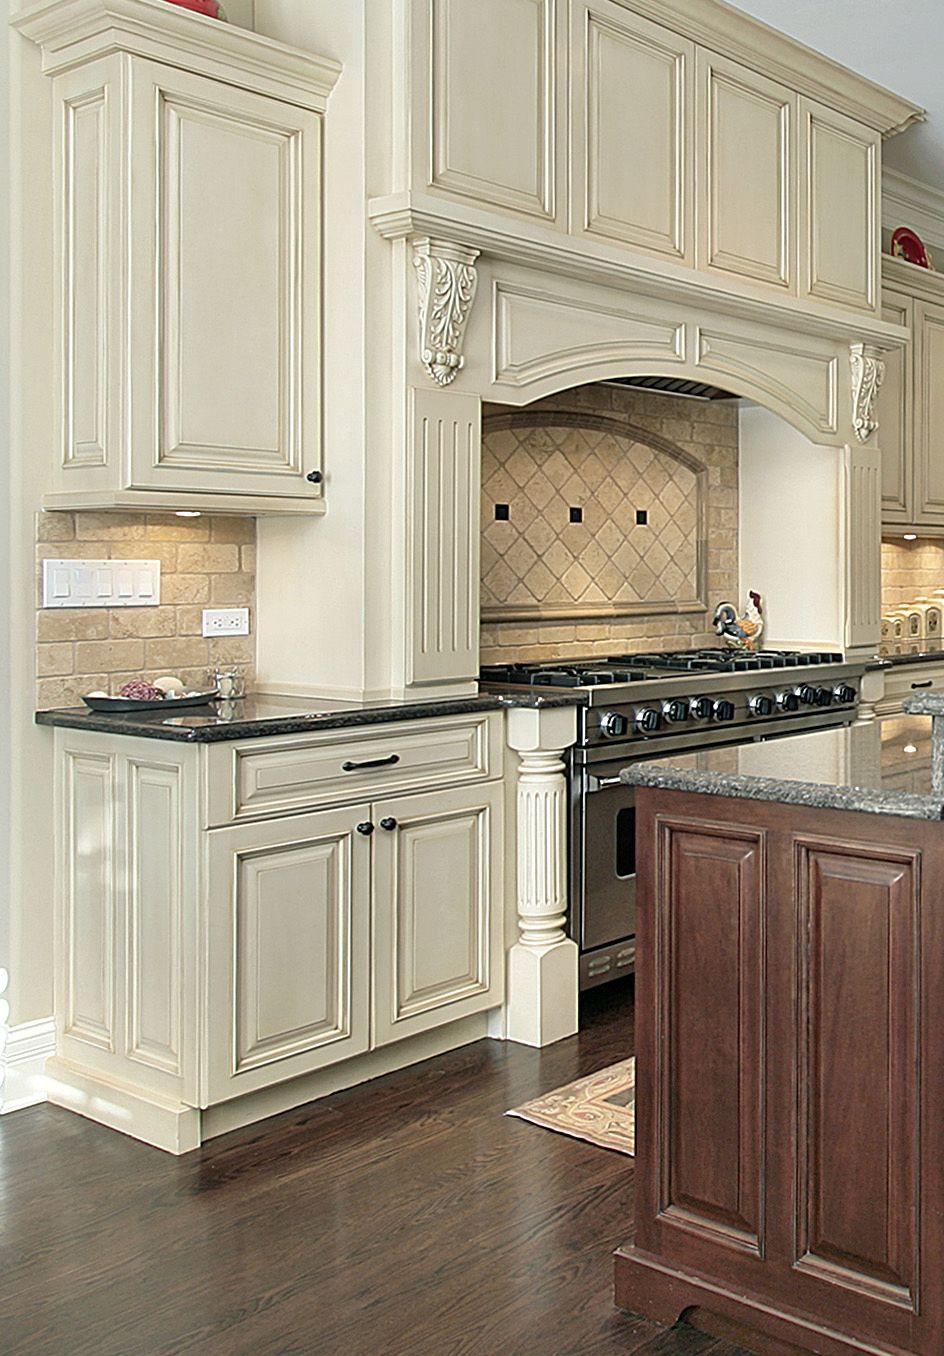 Prasada antique white kitchen with large decorative range hood walnut island design ideas